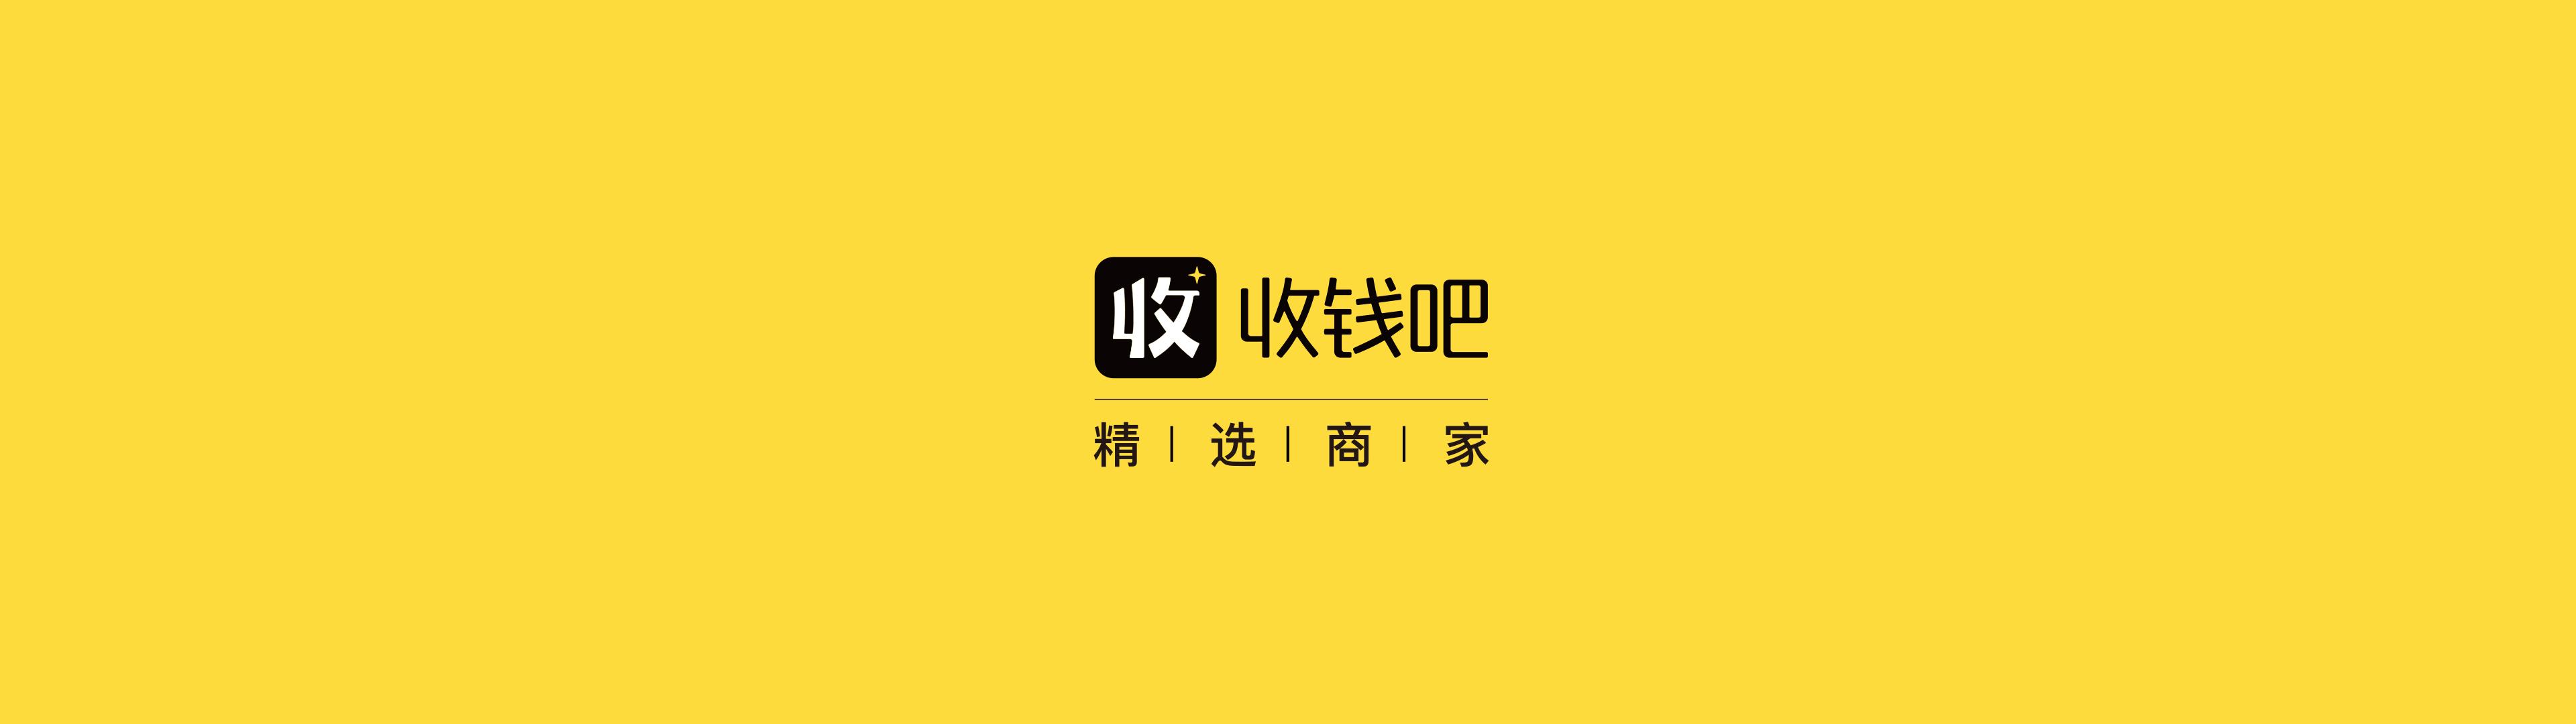 MONEY RECEIVING VOICE BOX TYPE II 场景图